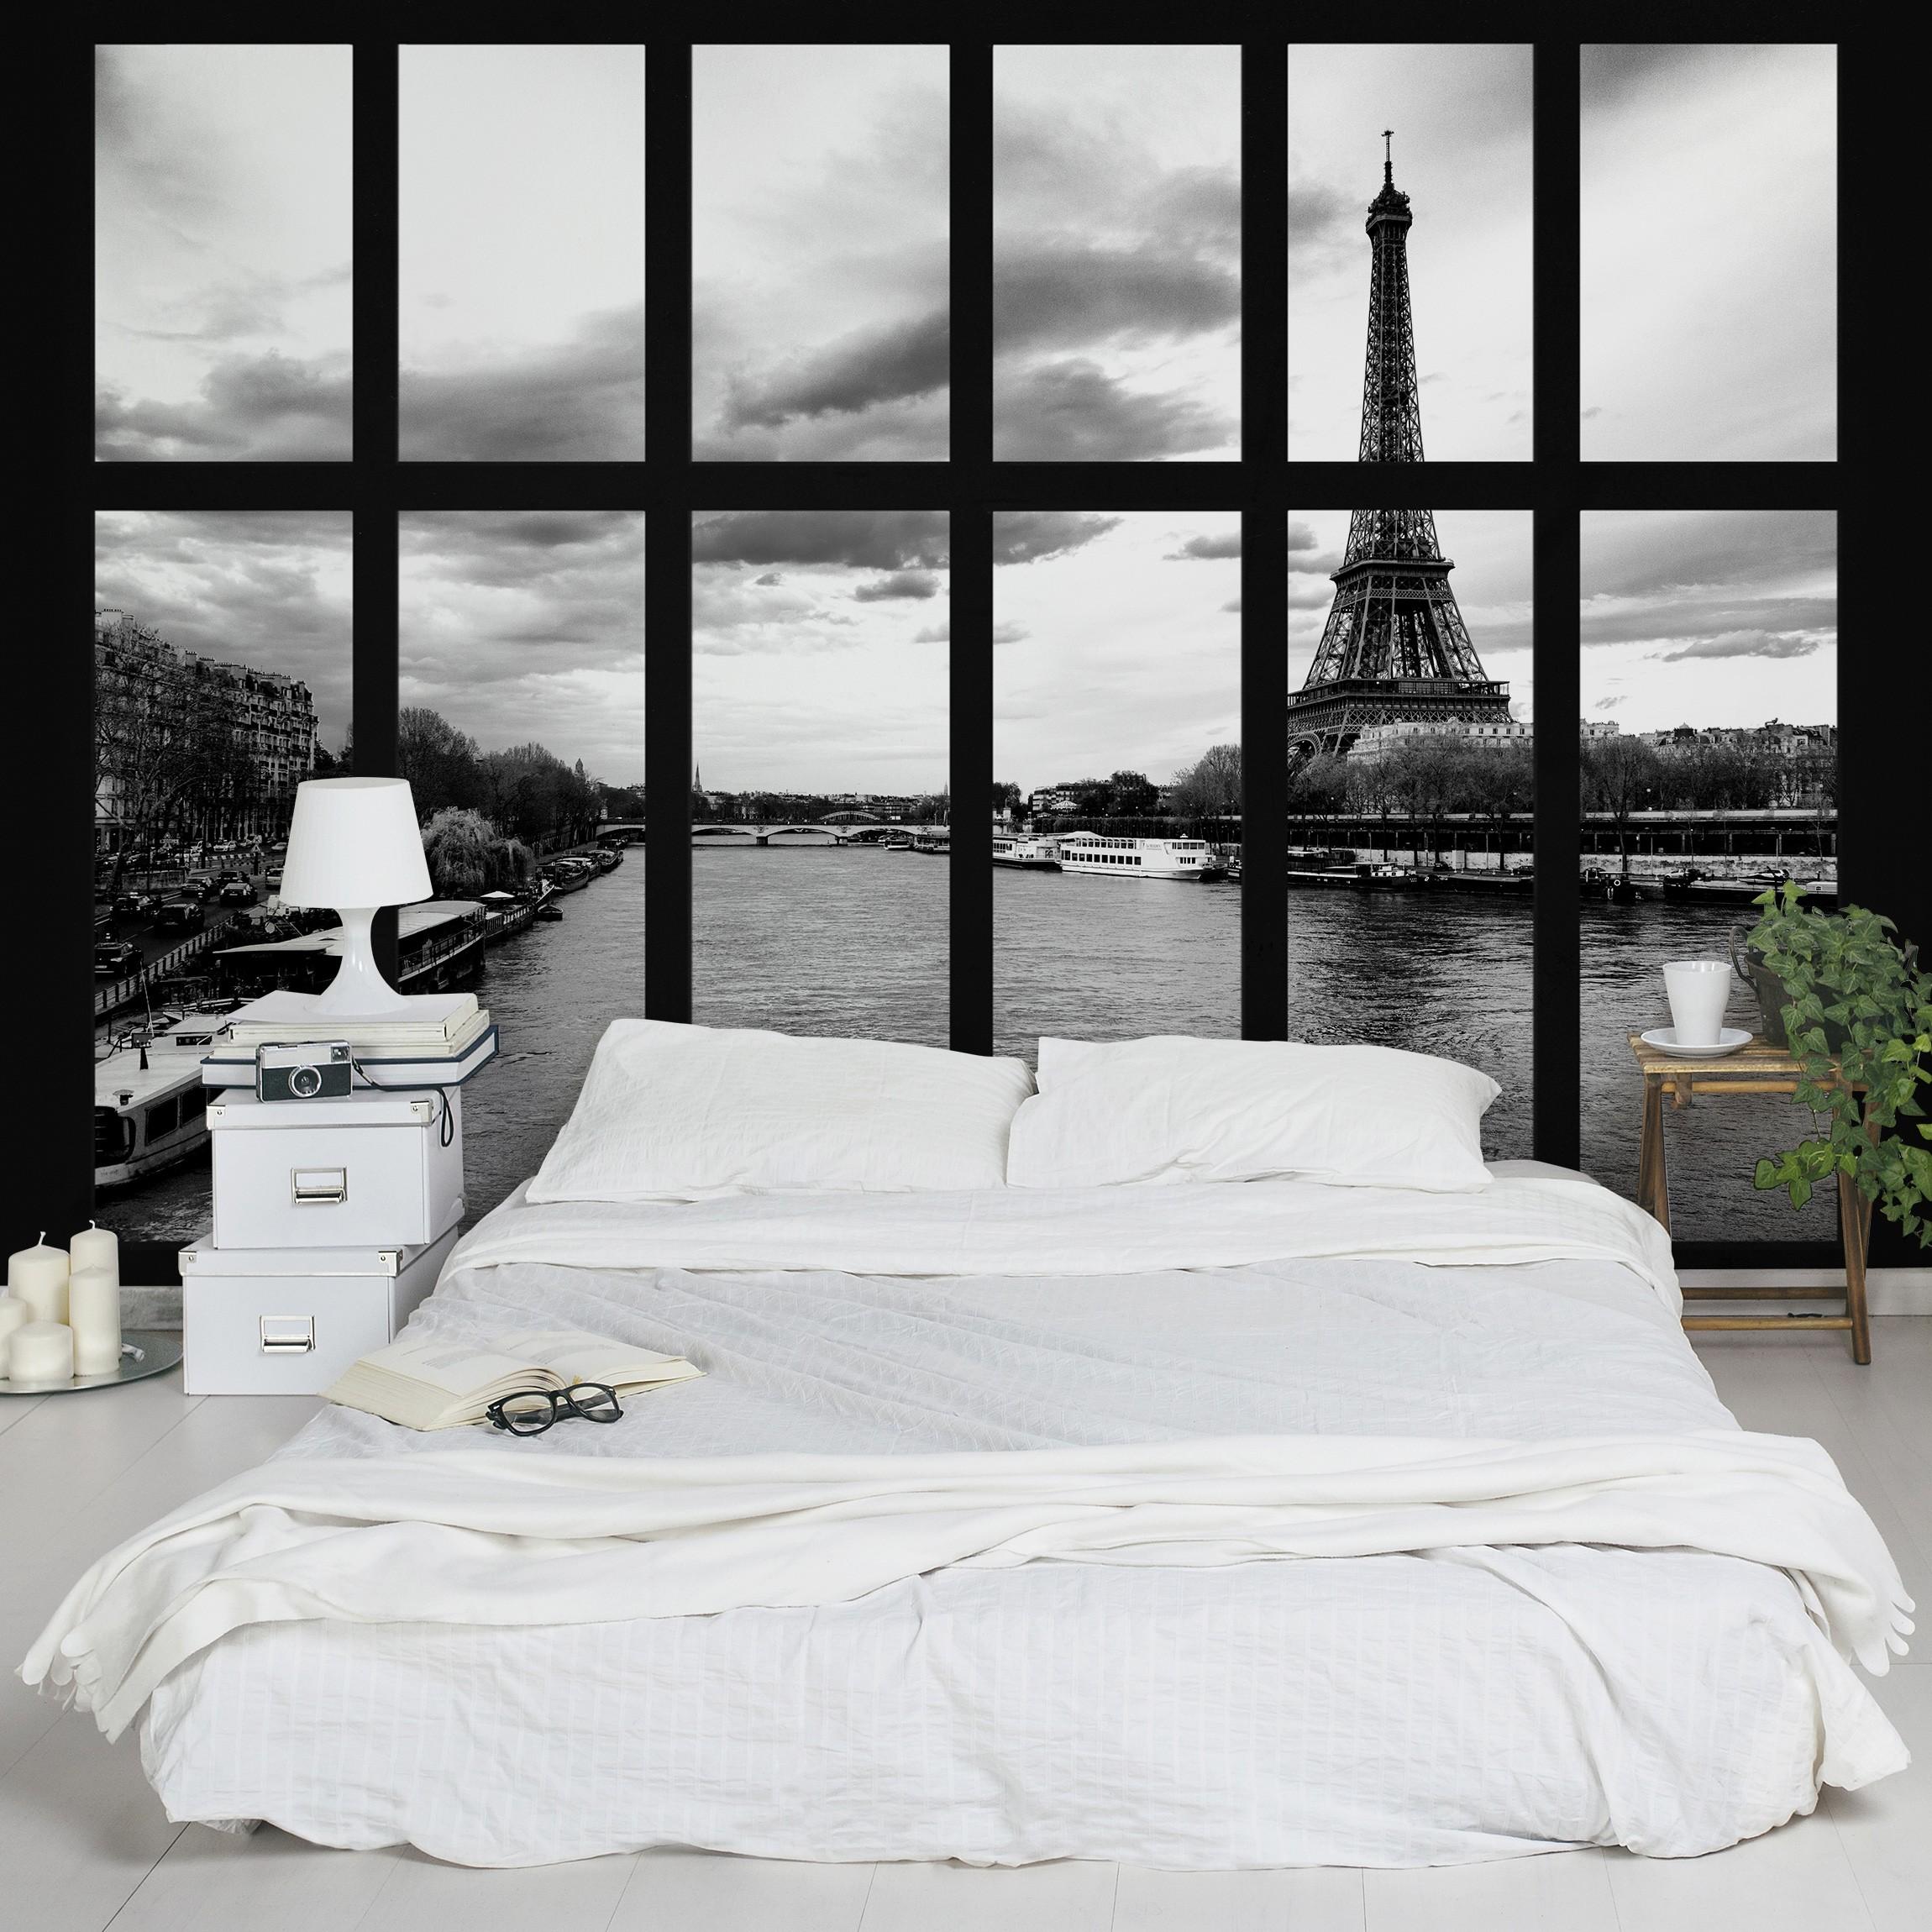 selbstklebende paris tapete fenster eiffelturm seine paris. Black Bedroom Furniture Sets. Home Design Ideas